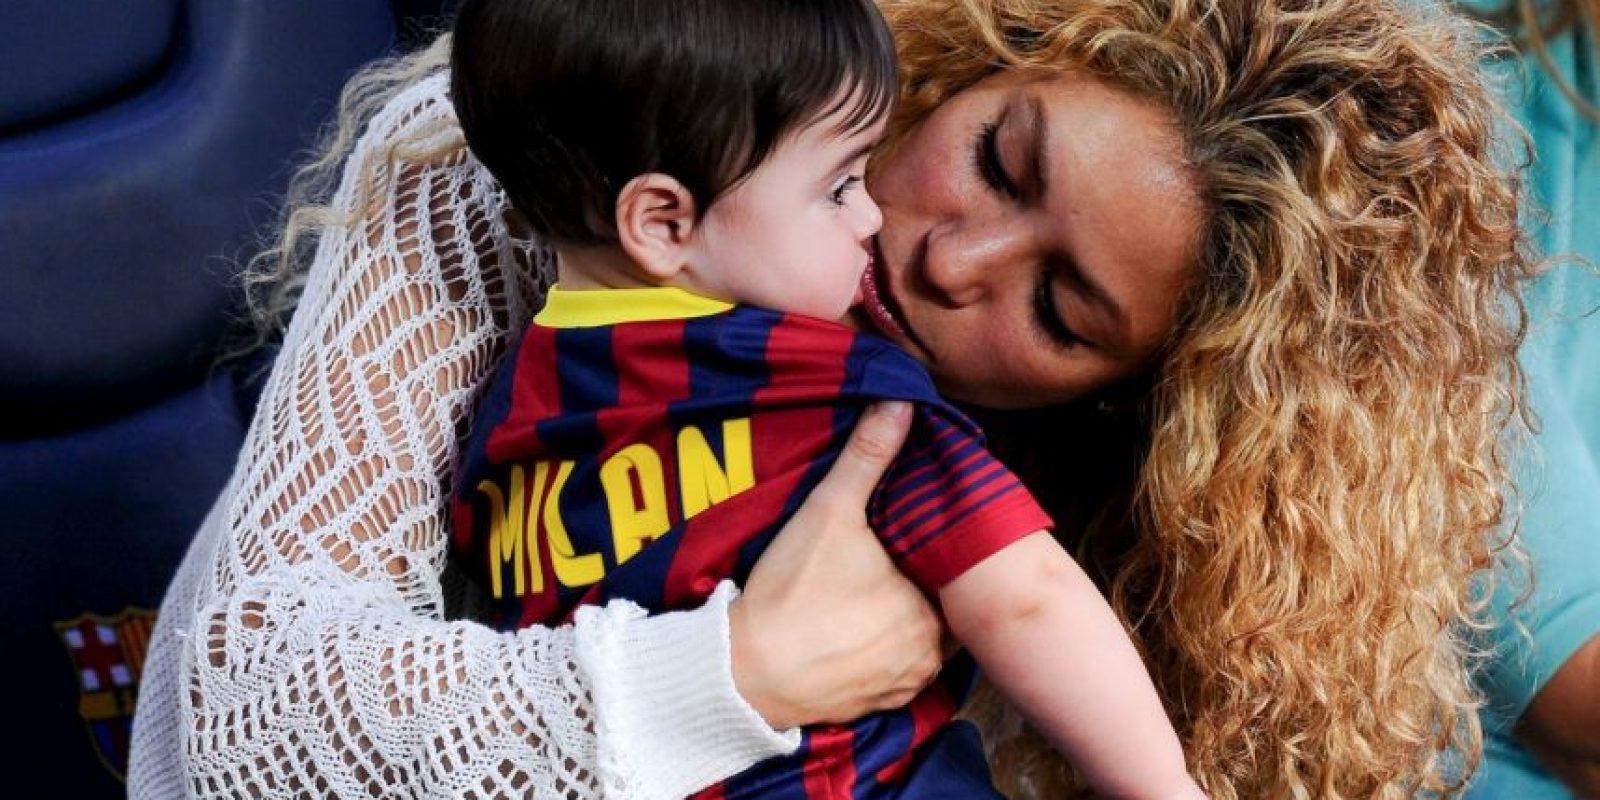 Nació el 22 de enero de 2013. Foto:Getty Images